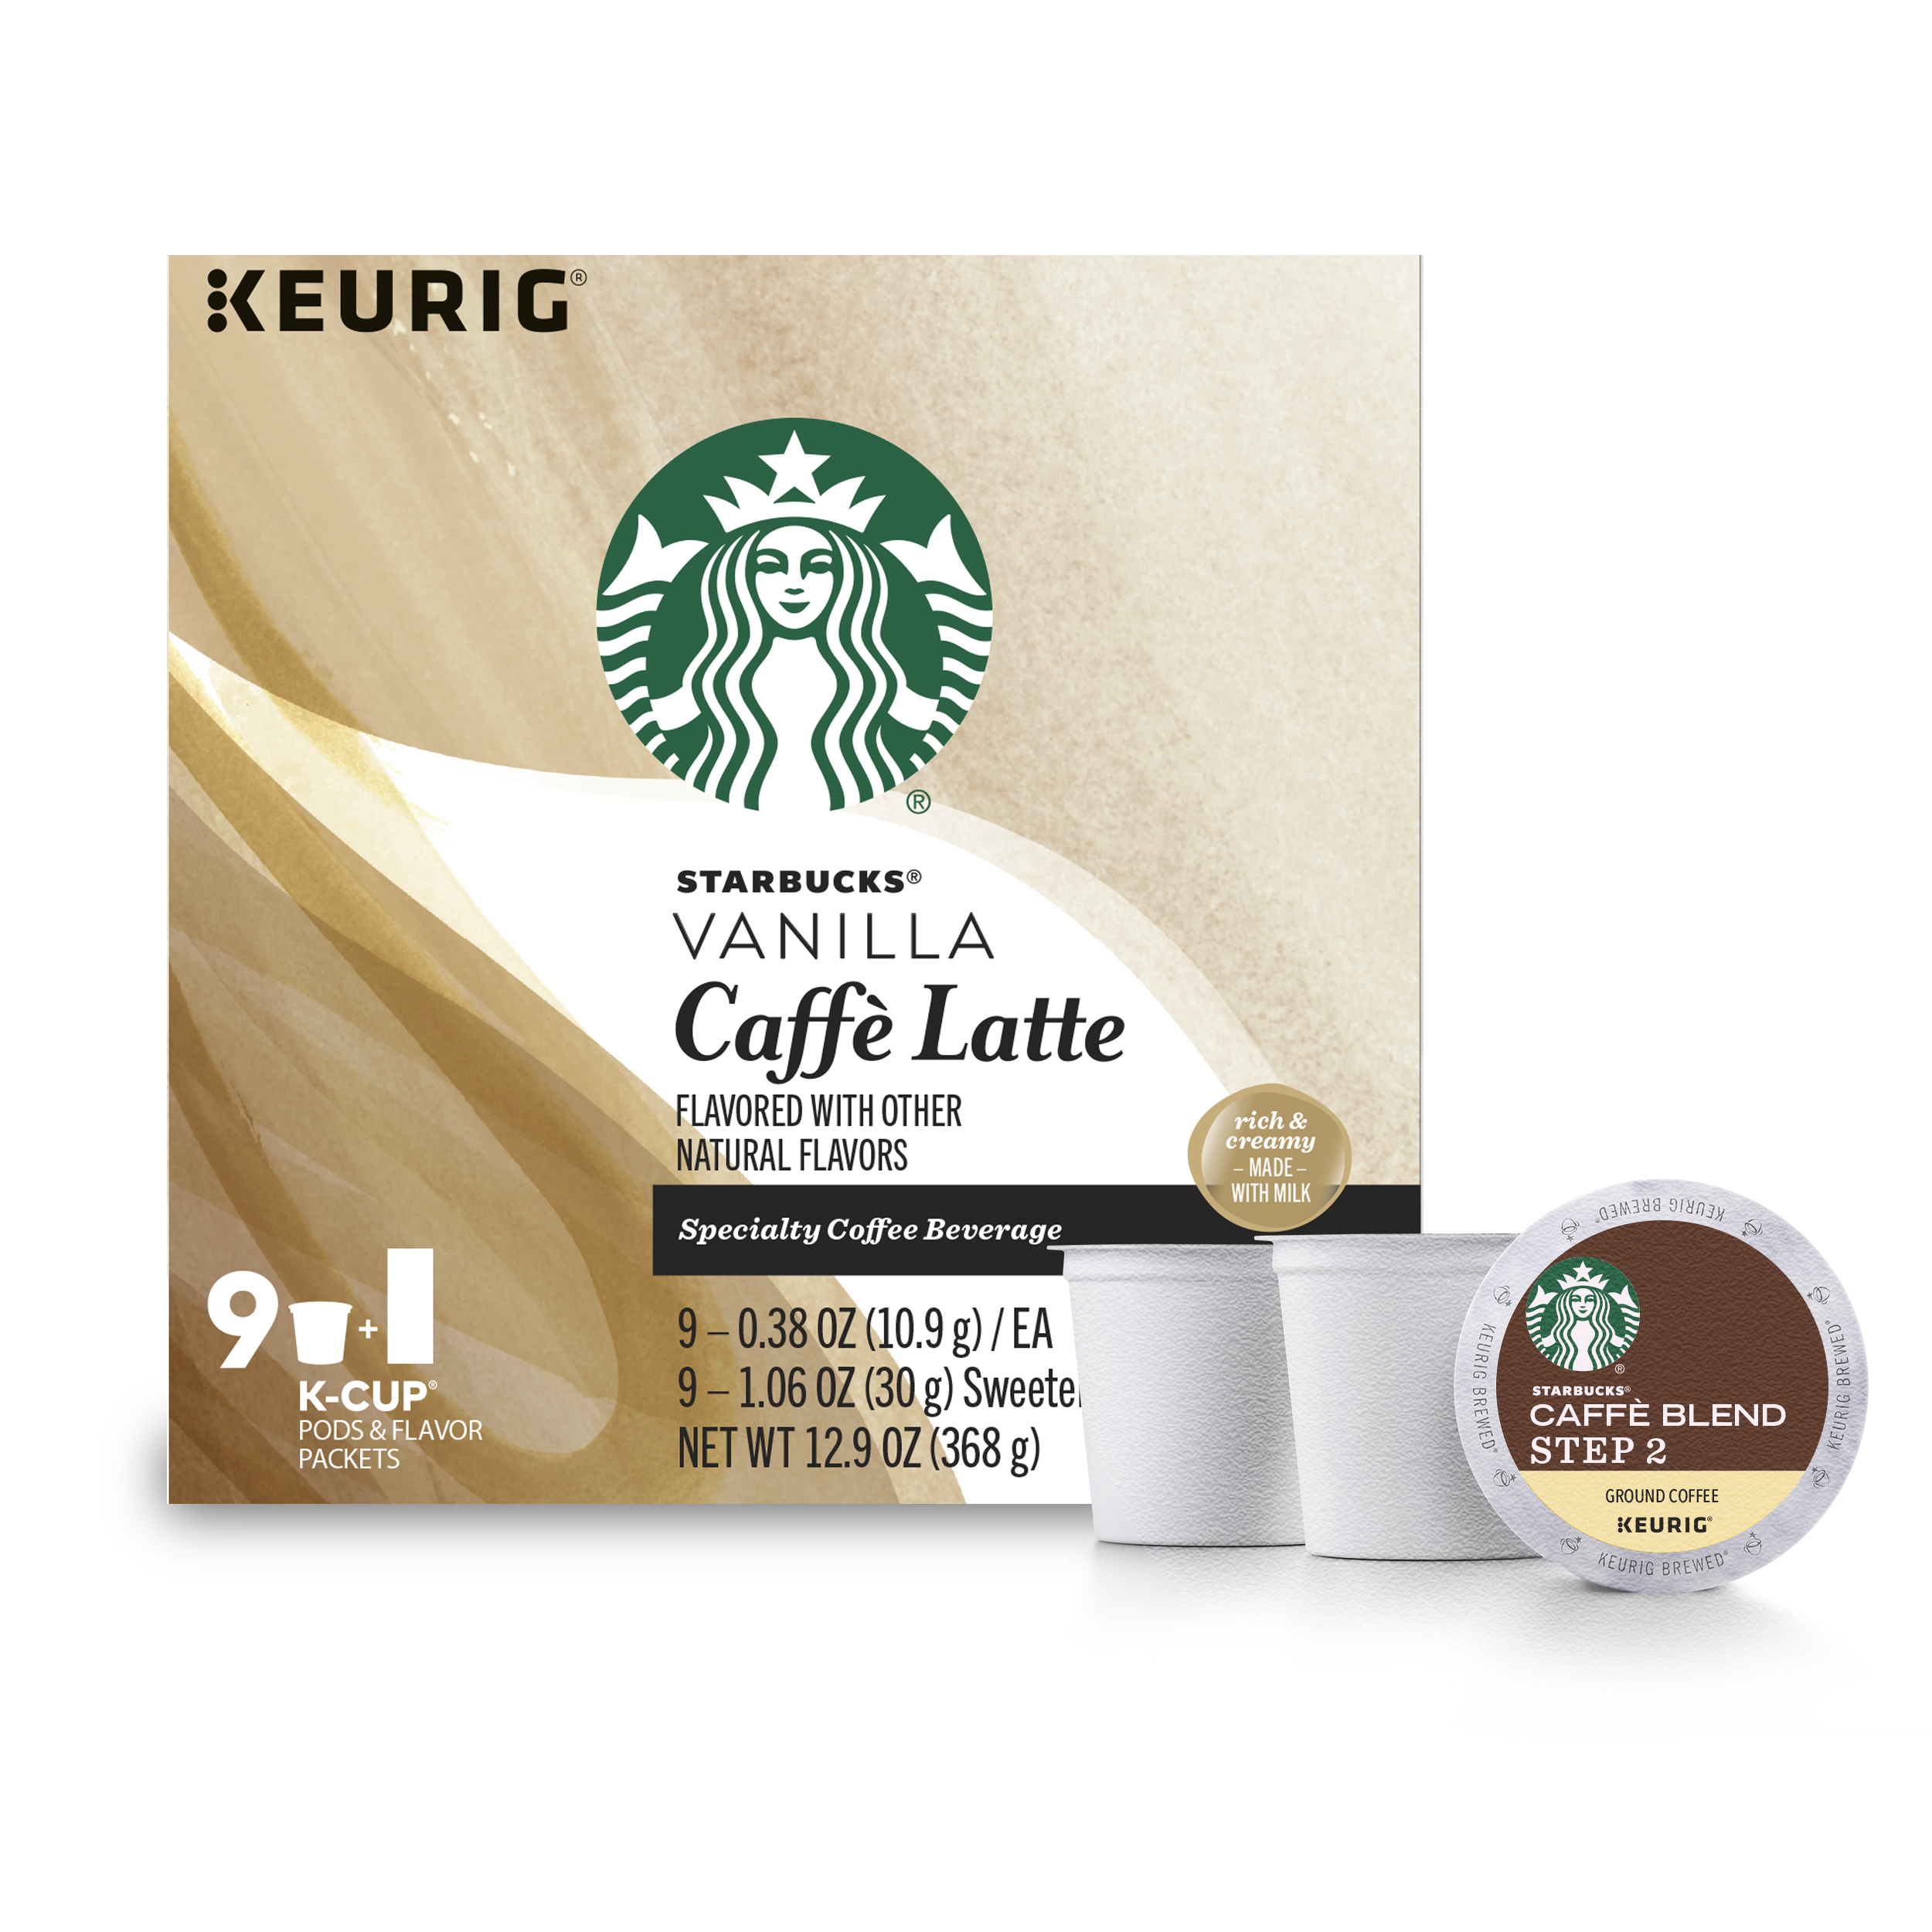 Starbucks Vanilla Caffe Latte Medium Roast Single Cup Coffee for Keurig Brewers, 1 Box of 9 (9 Total K-Cup Pods)